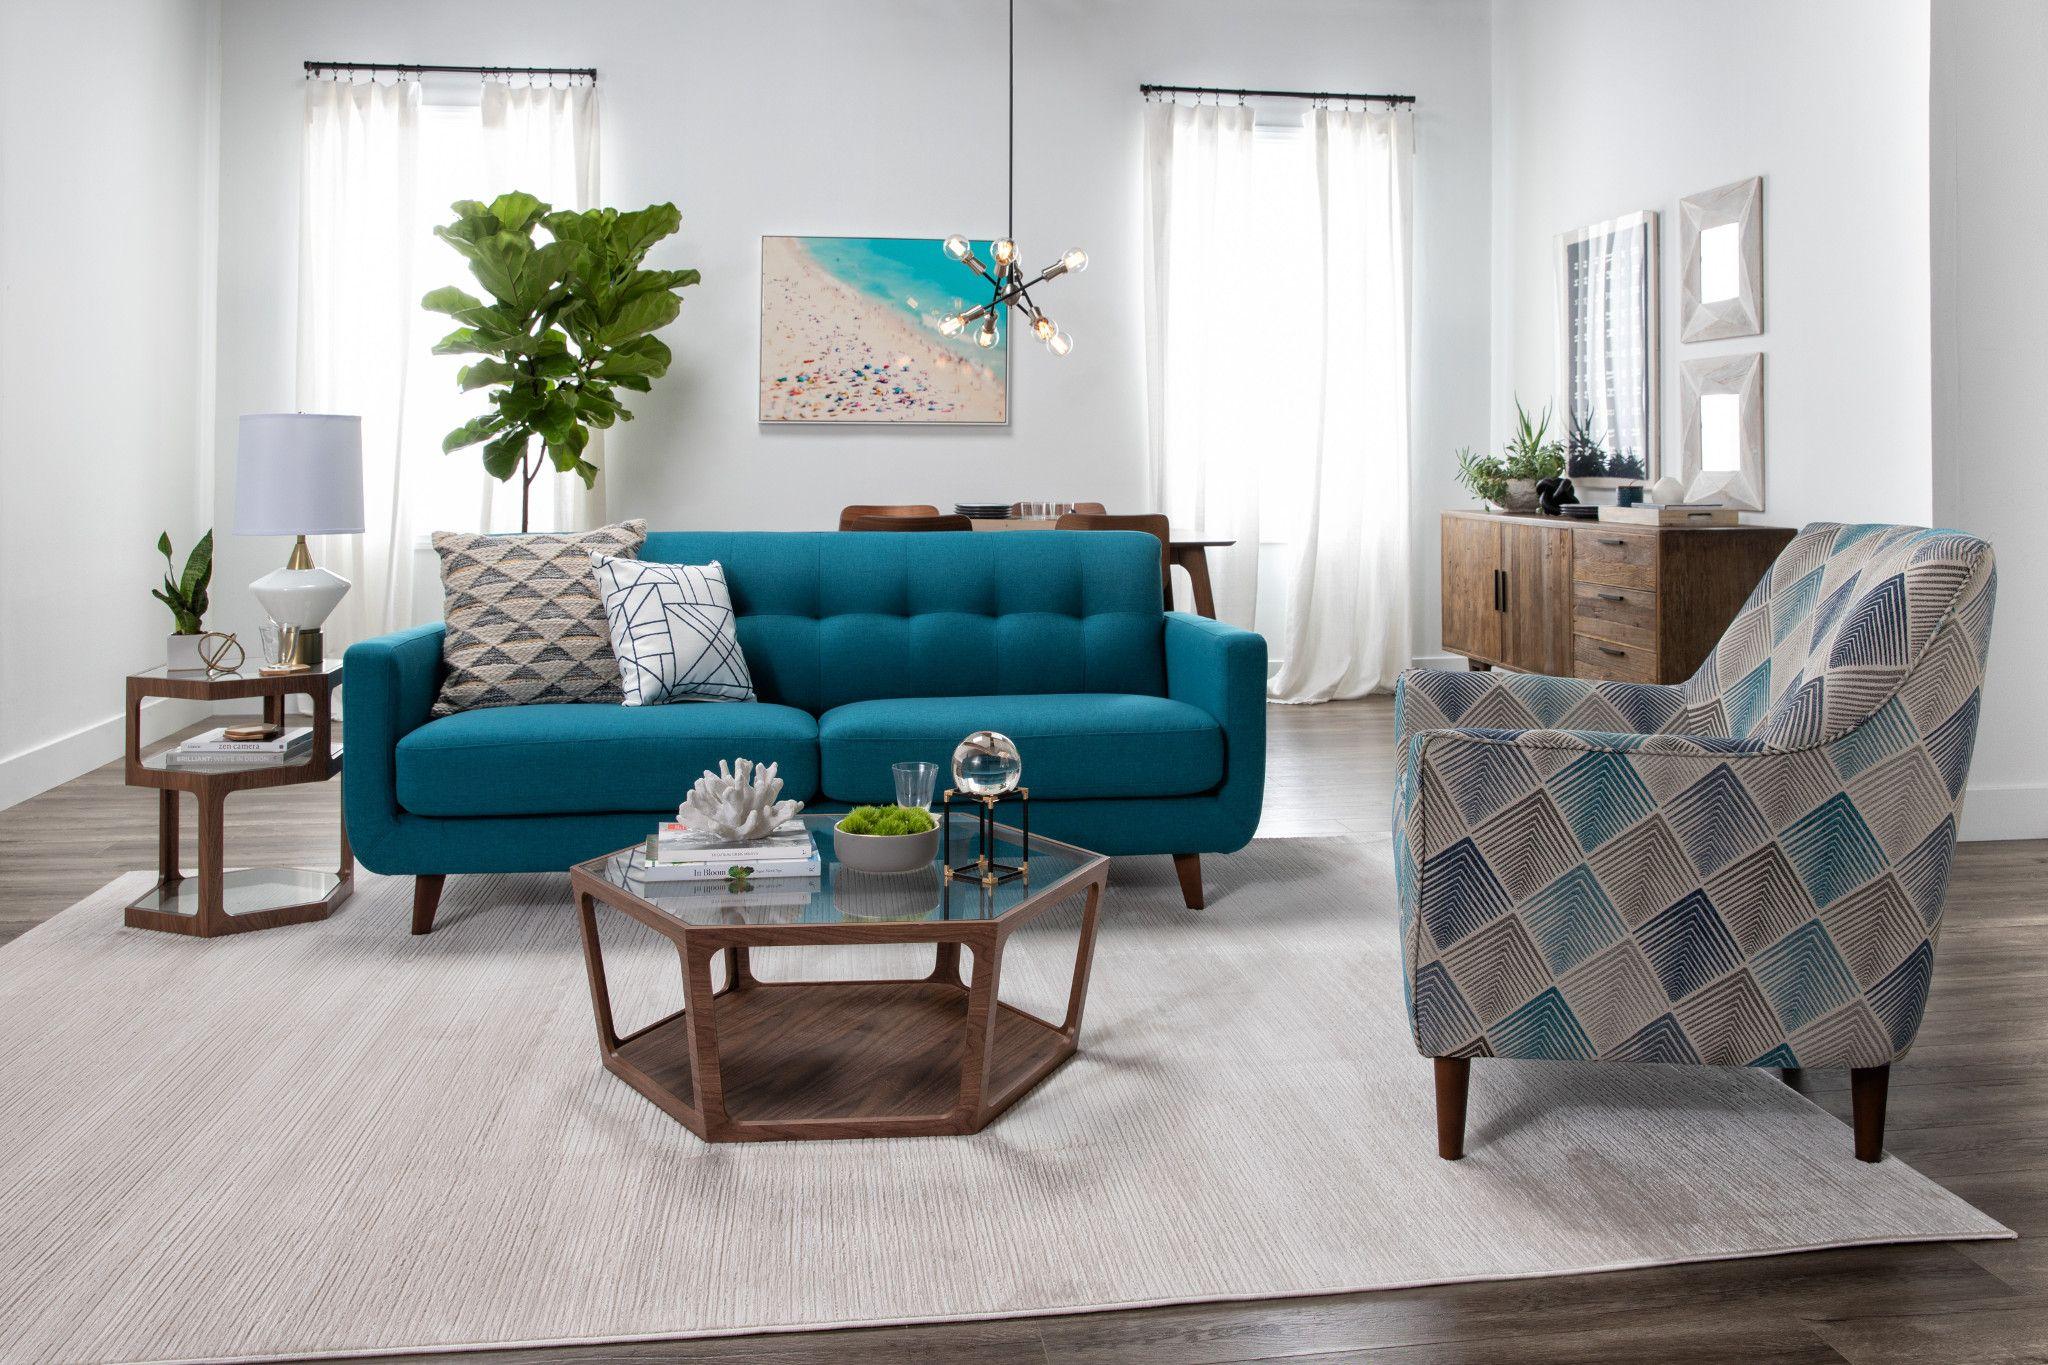 Allie Jade Sofa Turquoise Living Room Decor Living Room Designs Living Room Turquoise